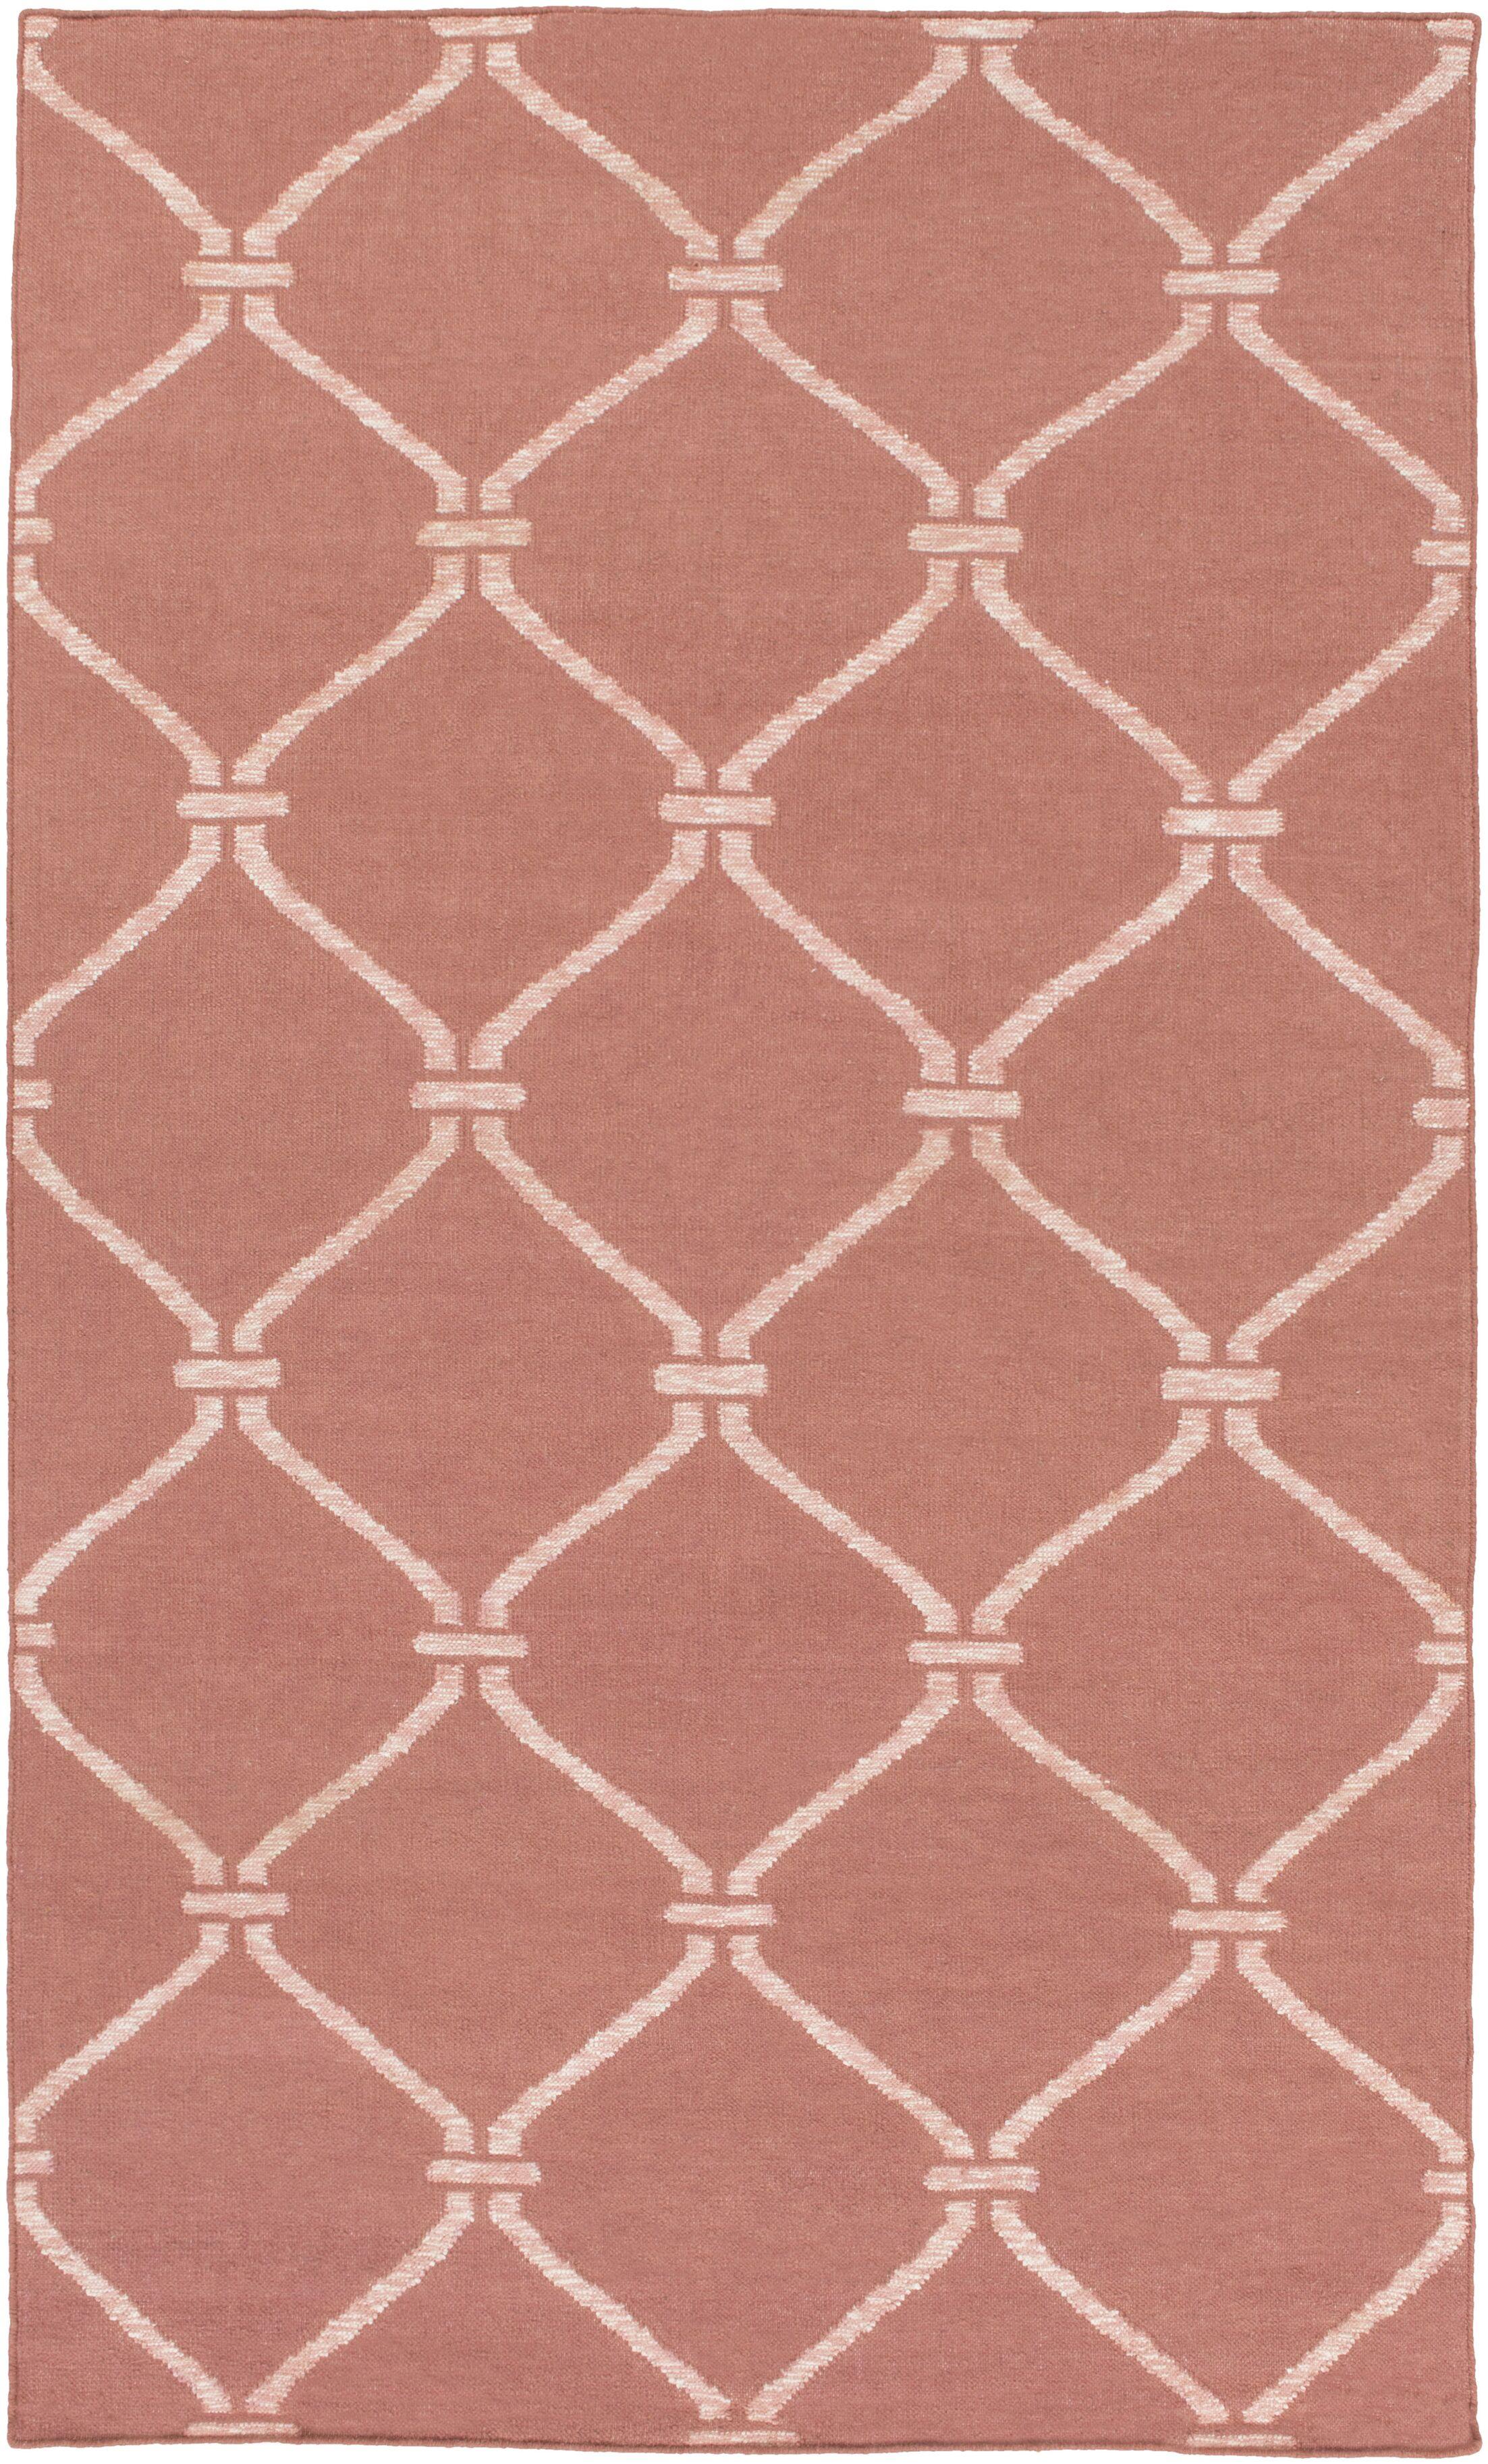 Landing Hand Woven Pink Area Rug Rug Size: Rectangle 8' x 10'